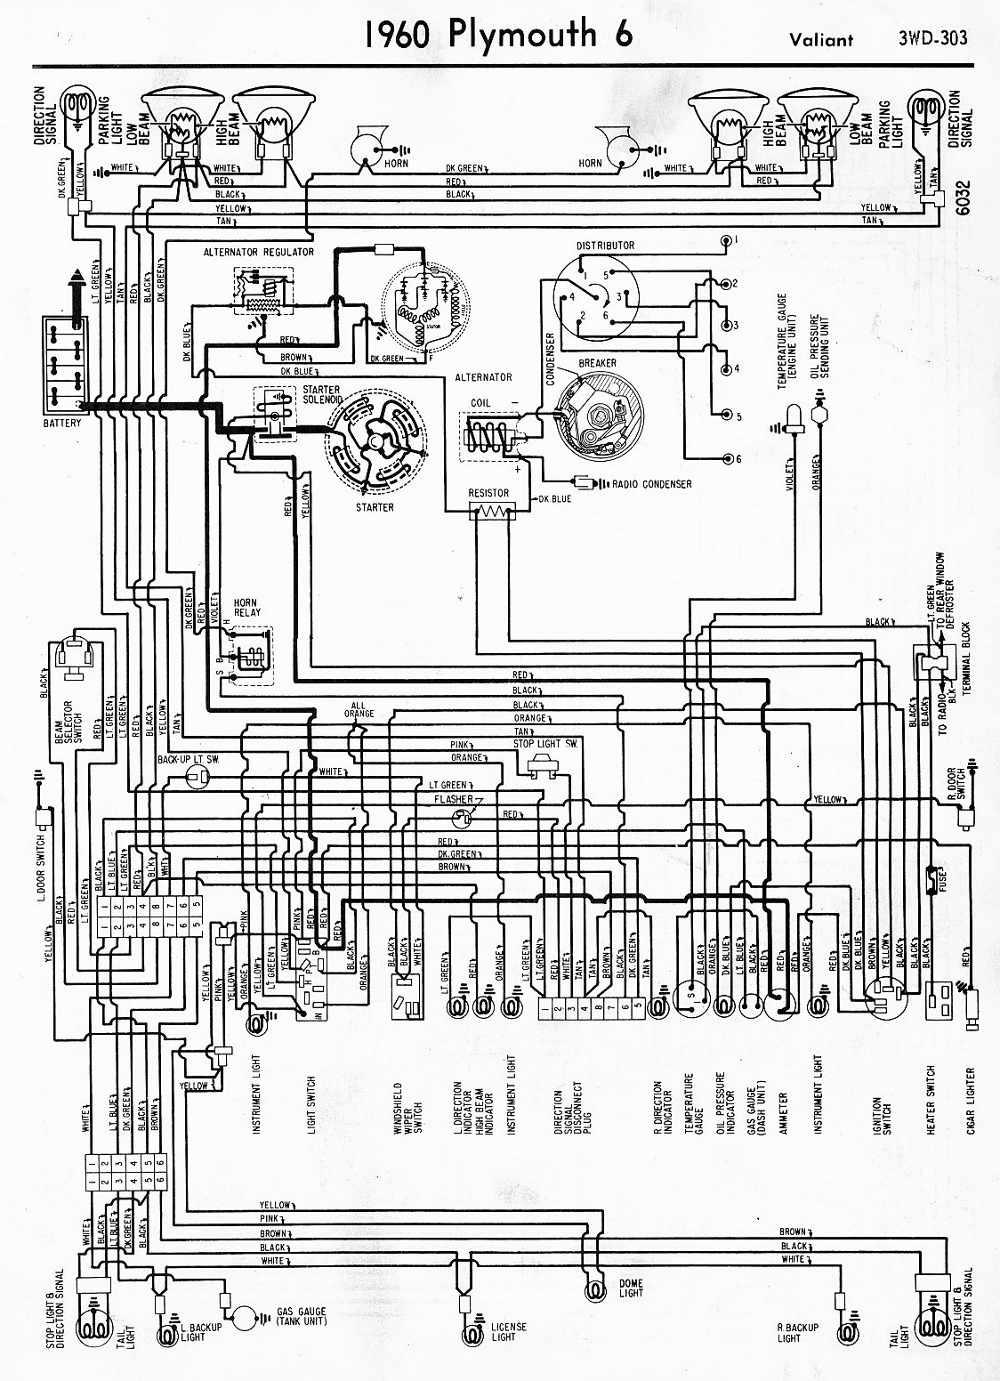 Marvelous Anc Relay Wiring Diagram Basic Electronics Wiring Diagram Wiring Digital Resources Bemuashebarightsorg